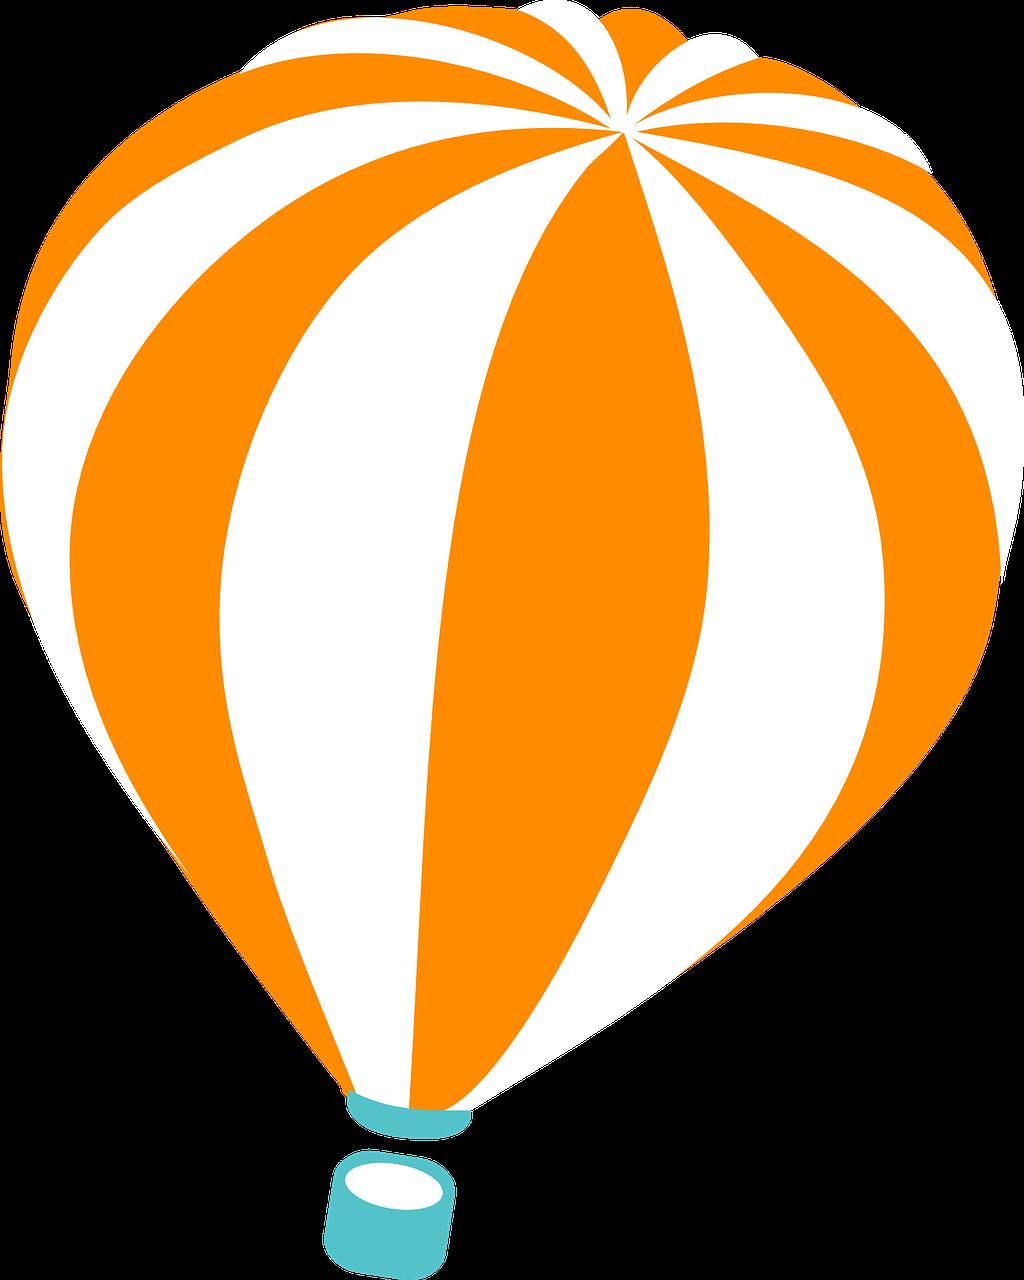 Orange clipart hot air balloon Domain Hot Art Clip Balloon